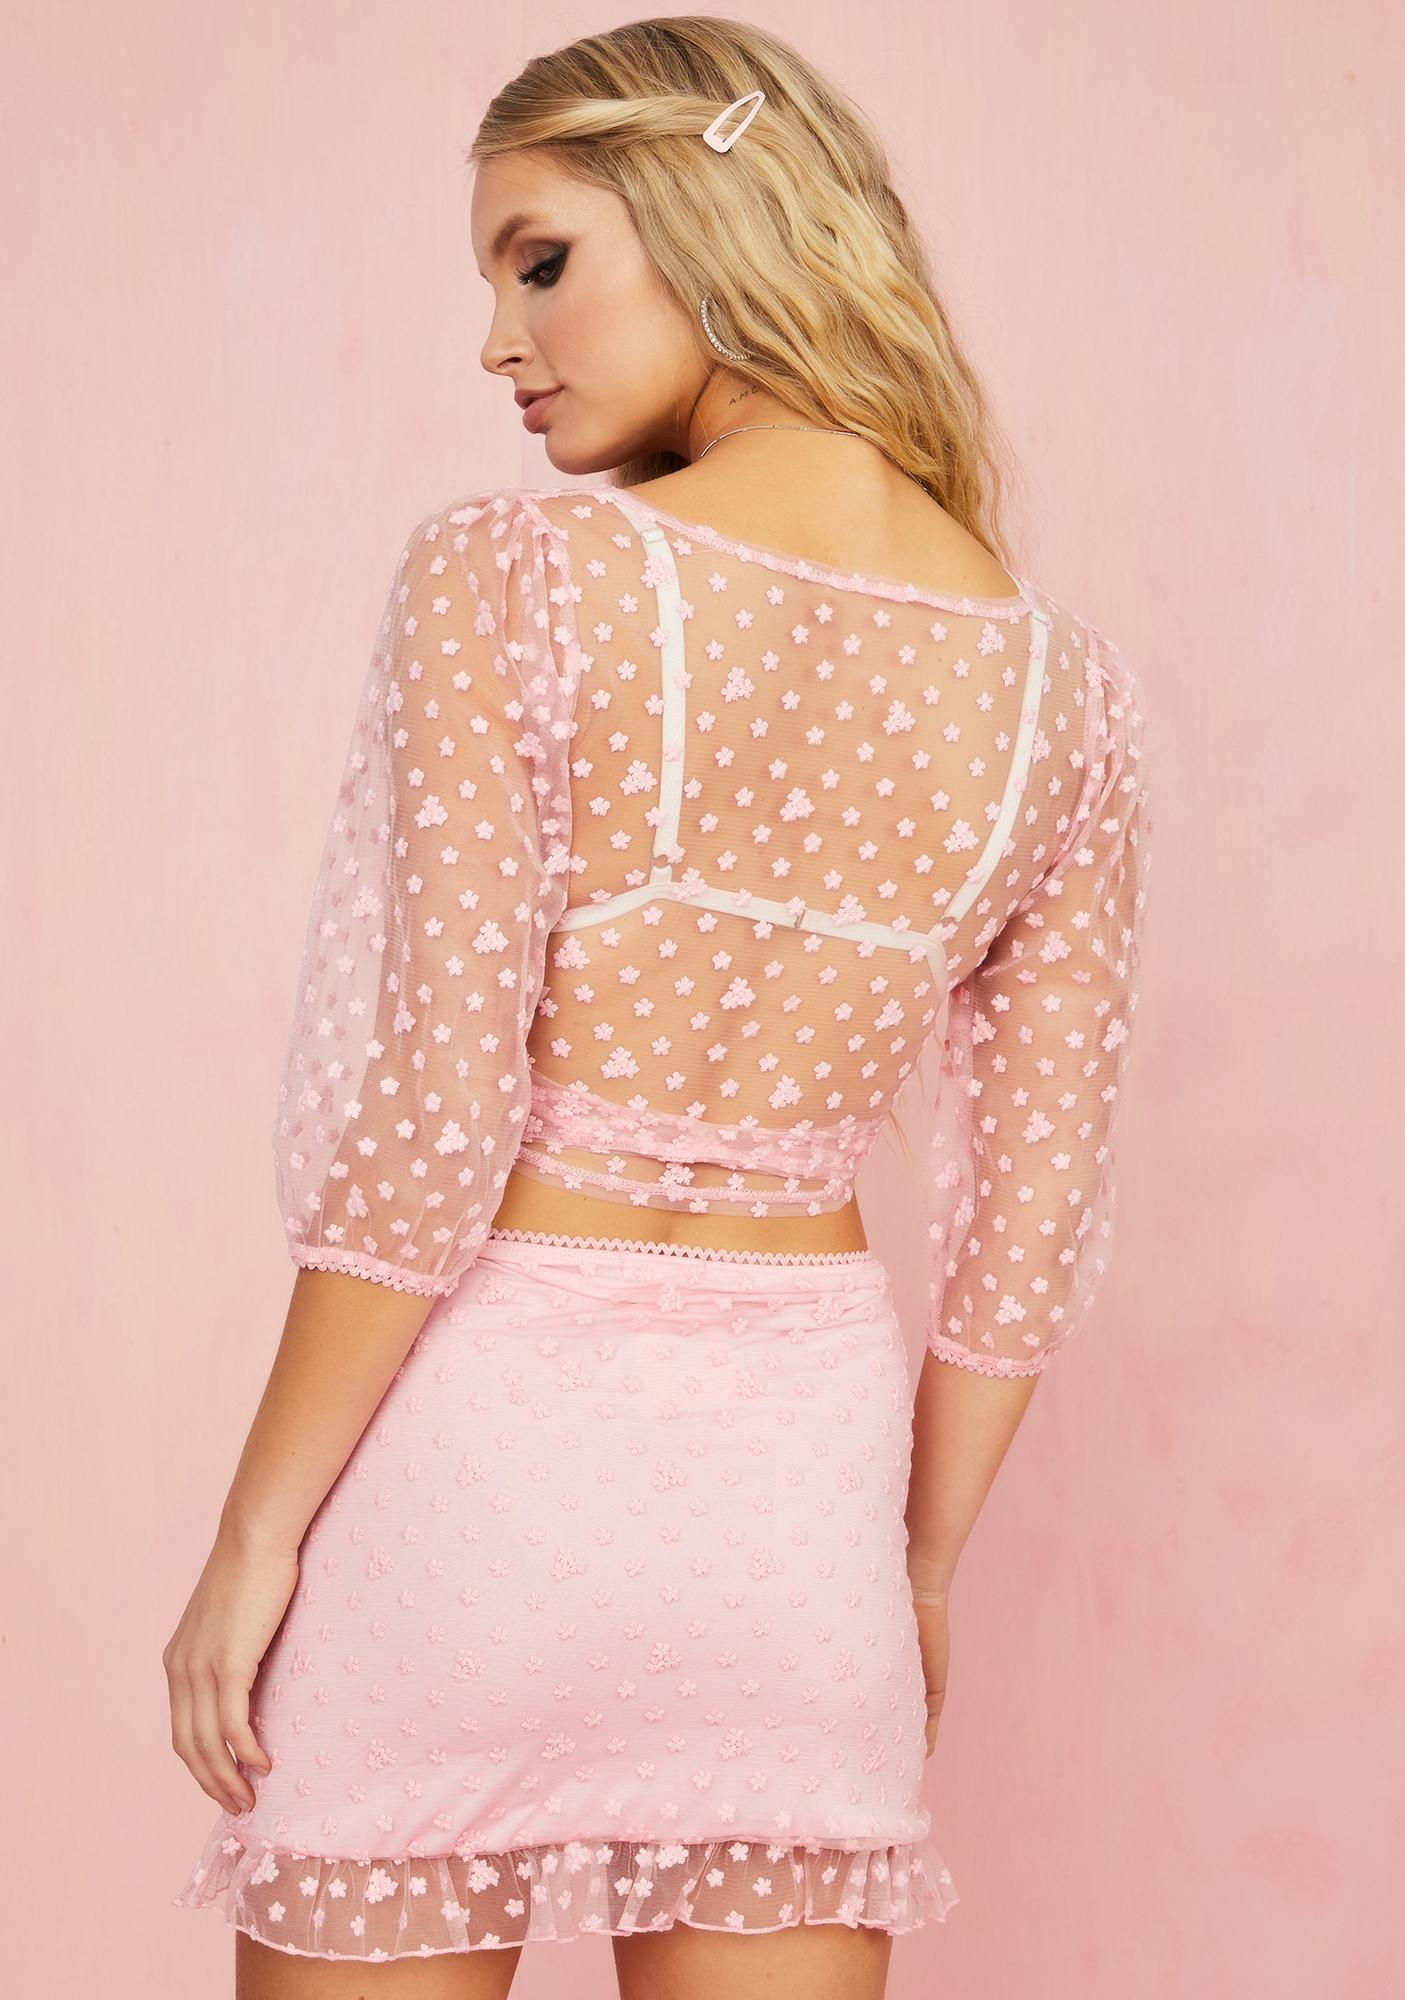 Sugar Thrillz Lust For Life Mini Skirt